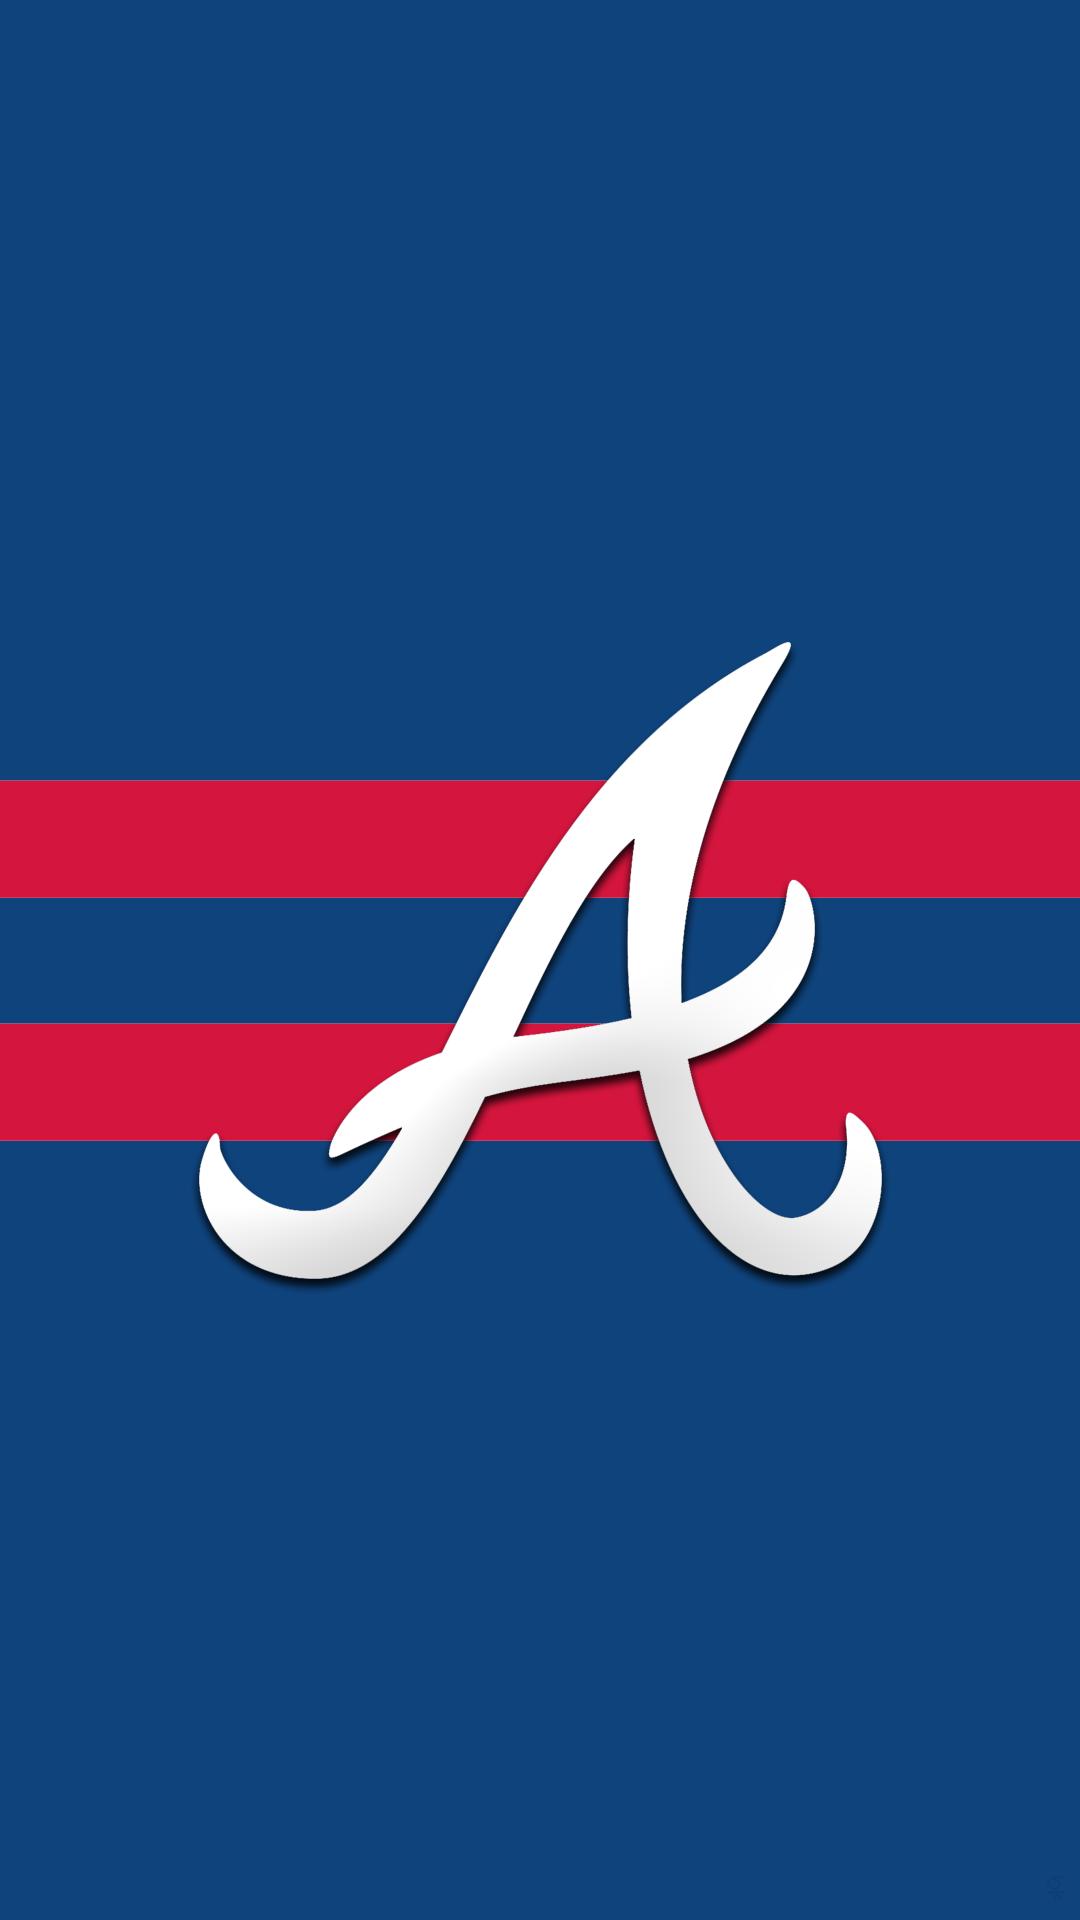 Pin By Brandon Lahr On My Teams Atlanta Braves Wallpaper Braves Baseball Atlanta Braves